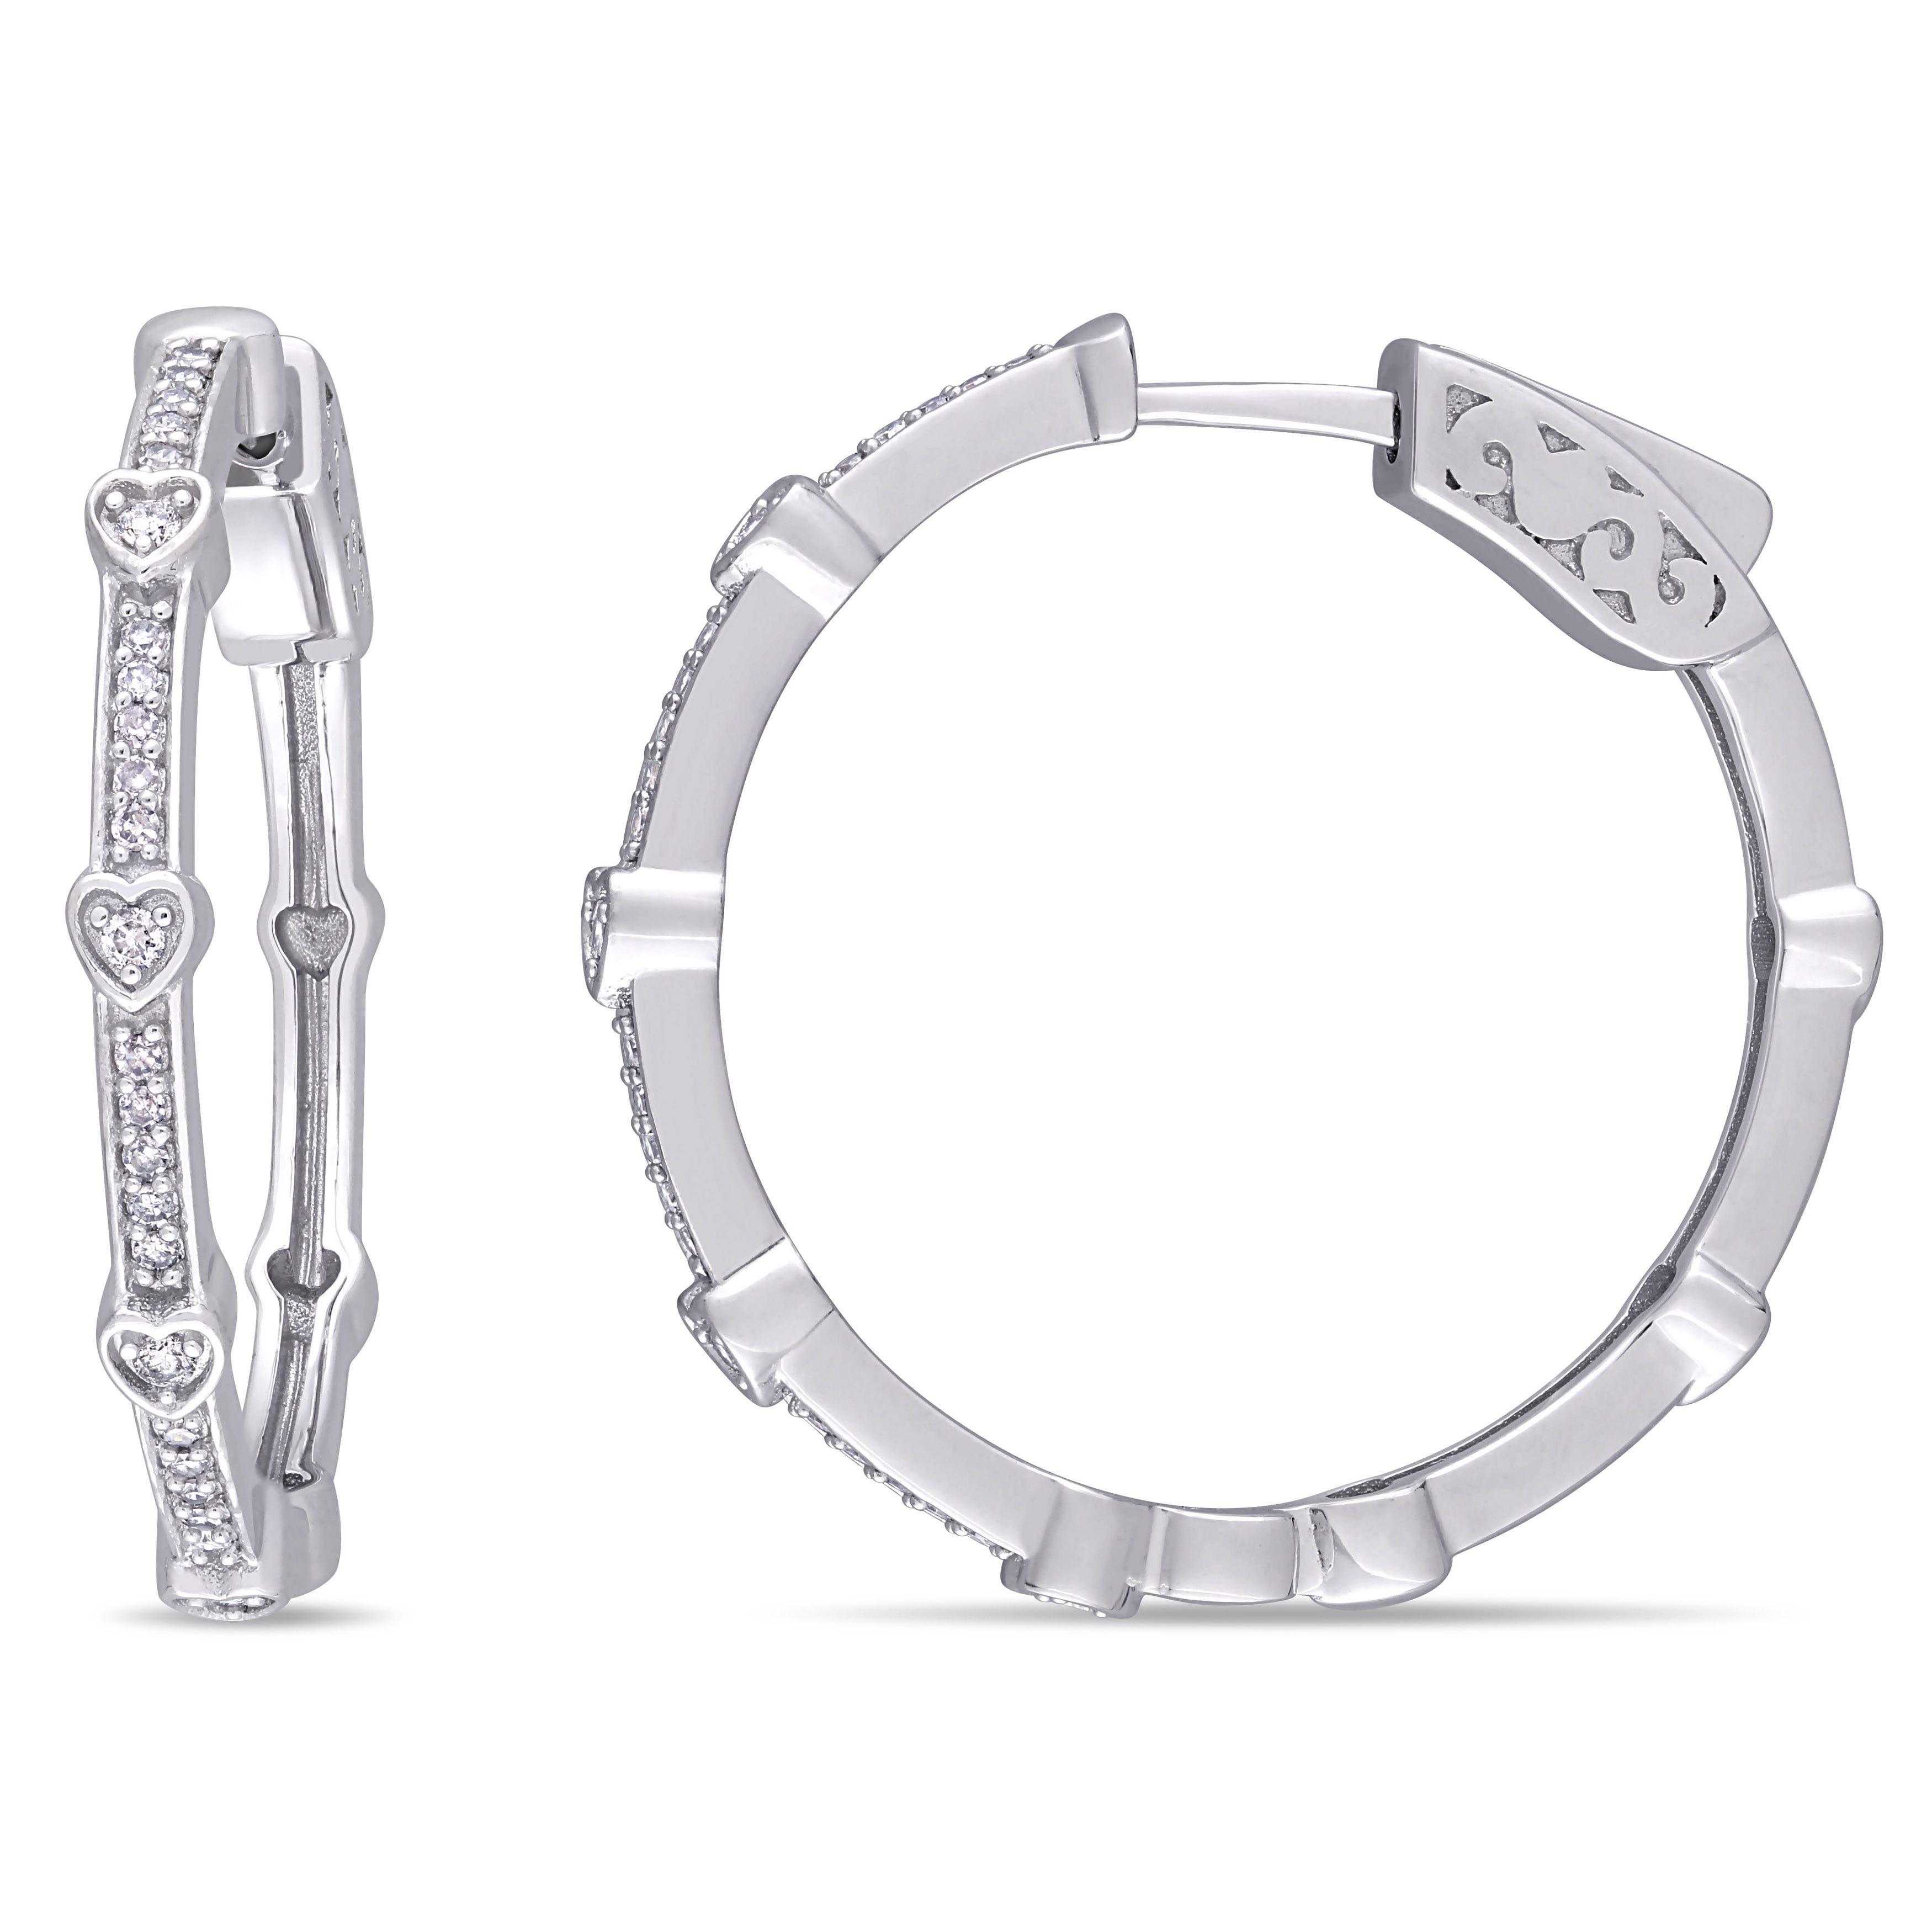 Diamond Hoop Earrings 1/4ctw. In 10k White Gold